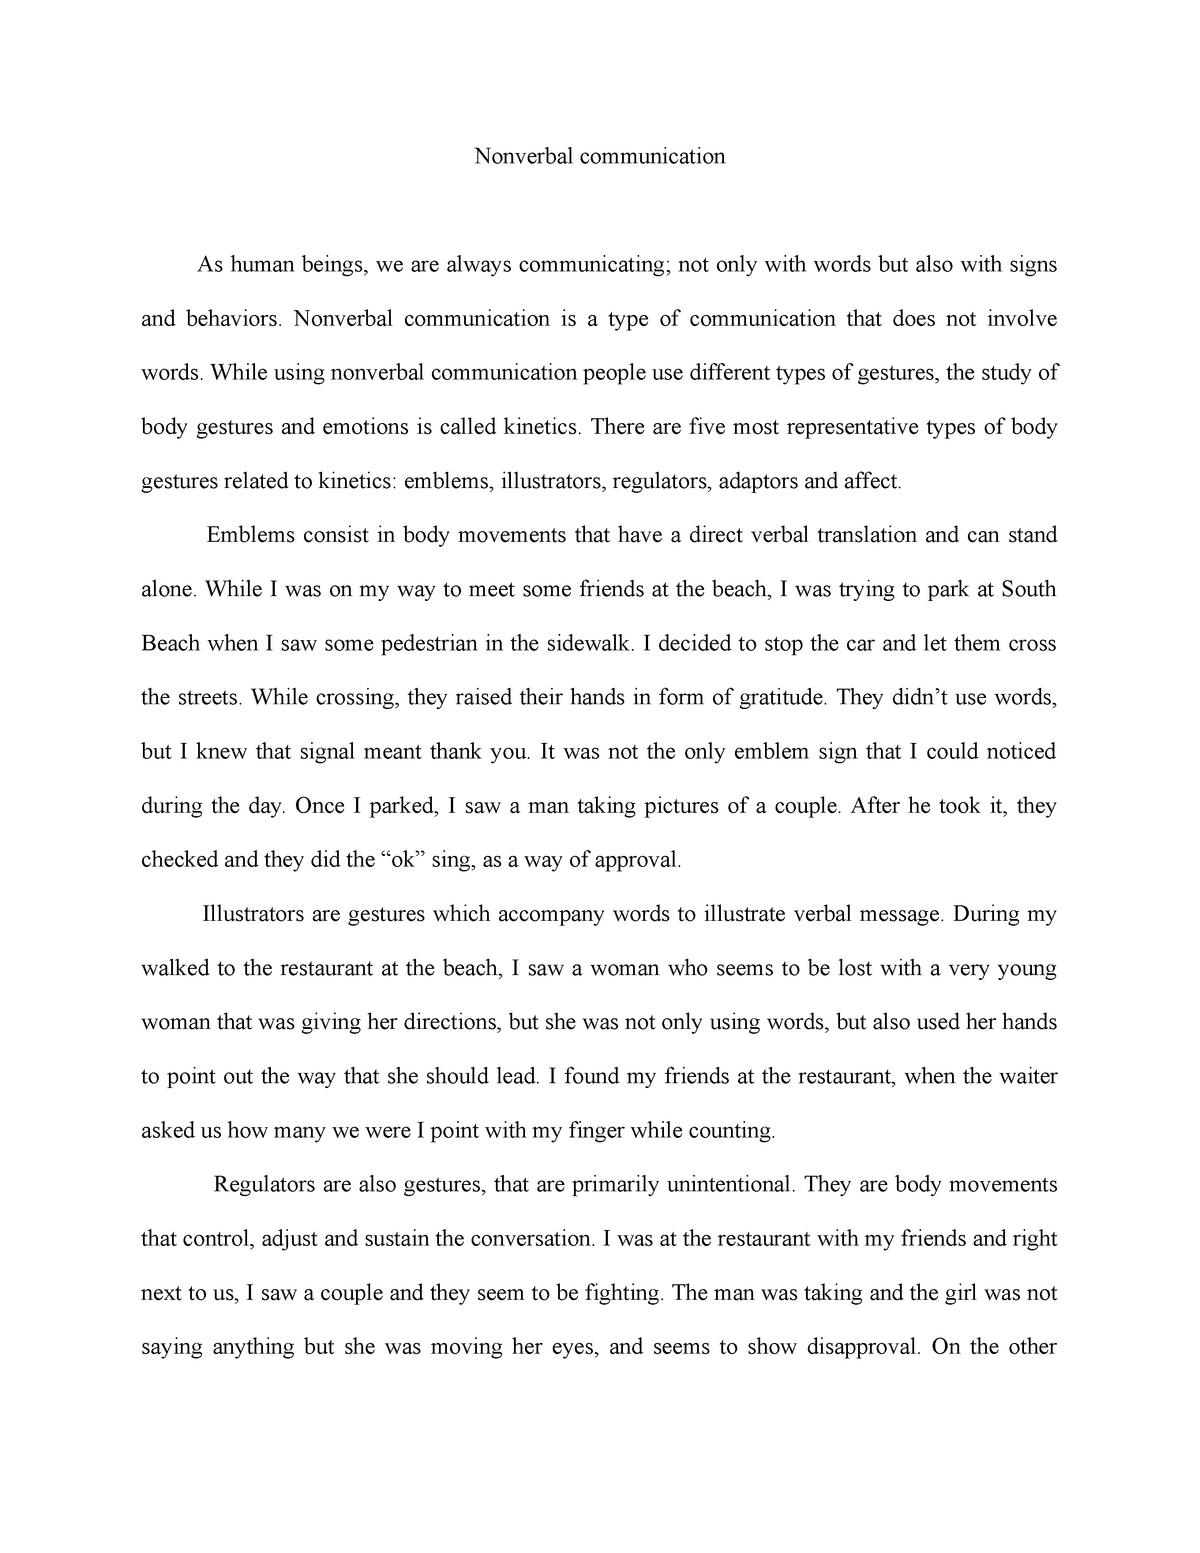 spc 1017 field work essay